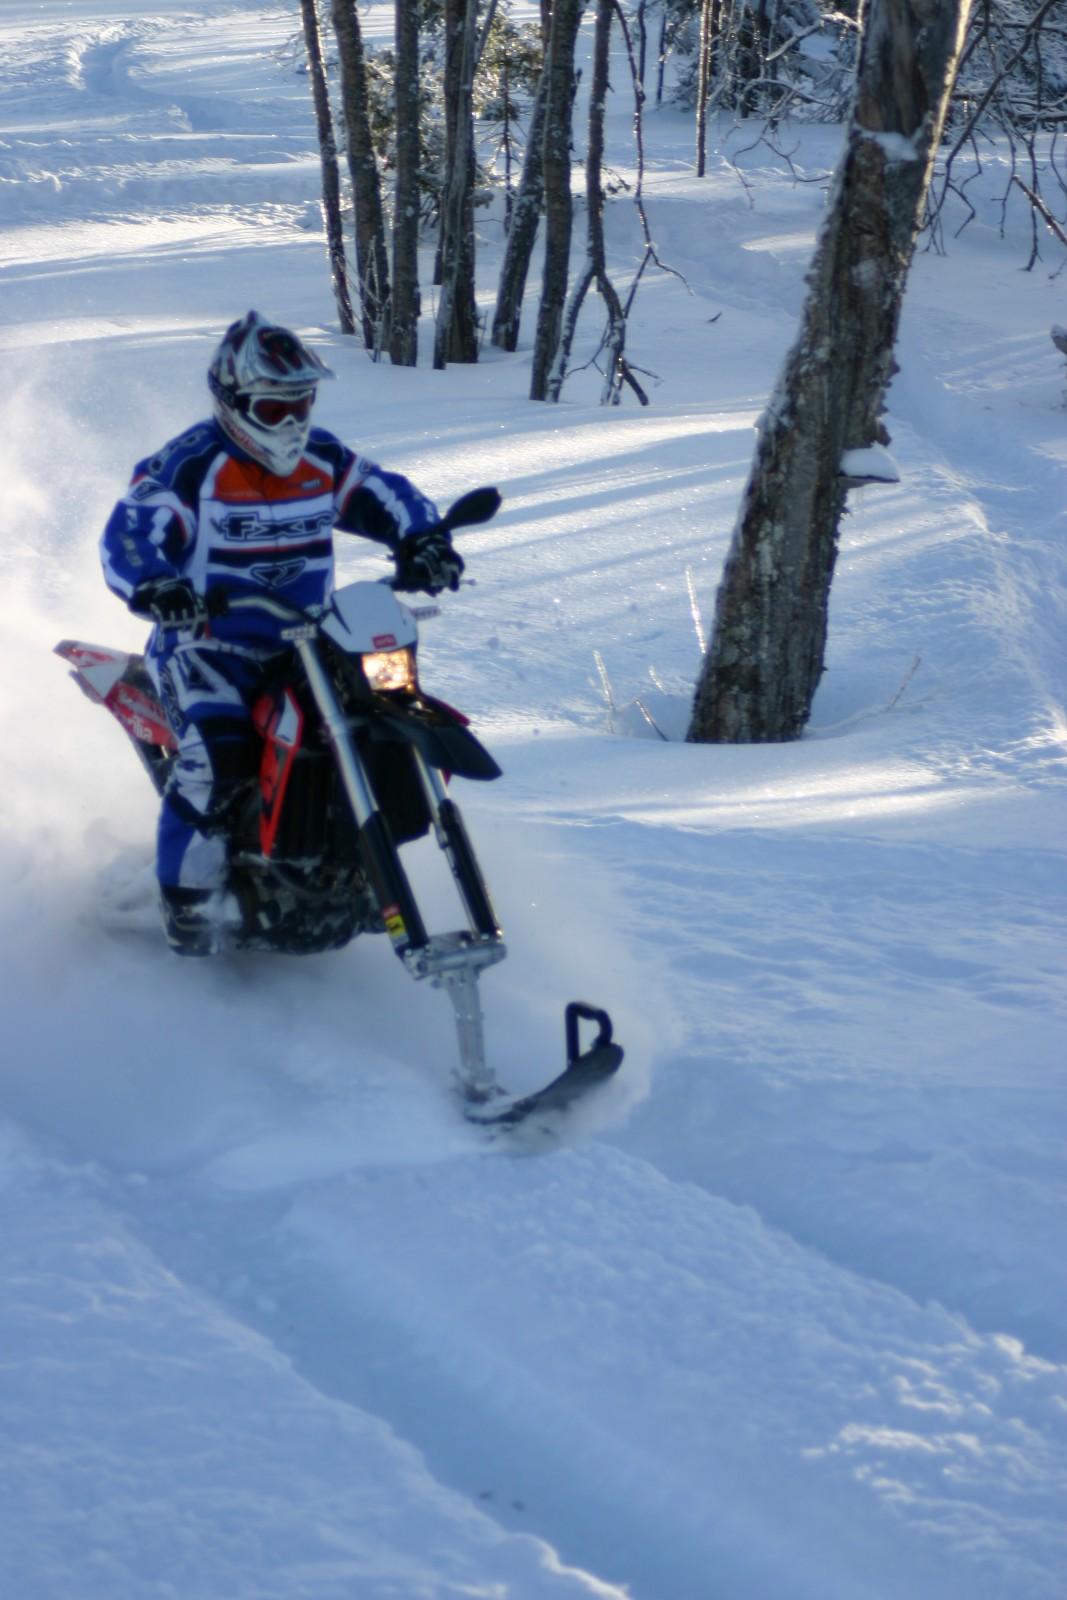 Explorer-snowbike-track-system-for-dirt-bike-supermoto-enduro-mx-AD-Boivin-120-1067x1600